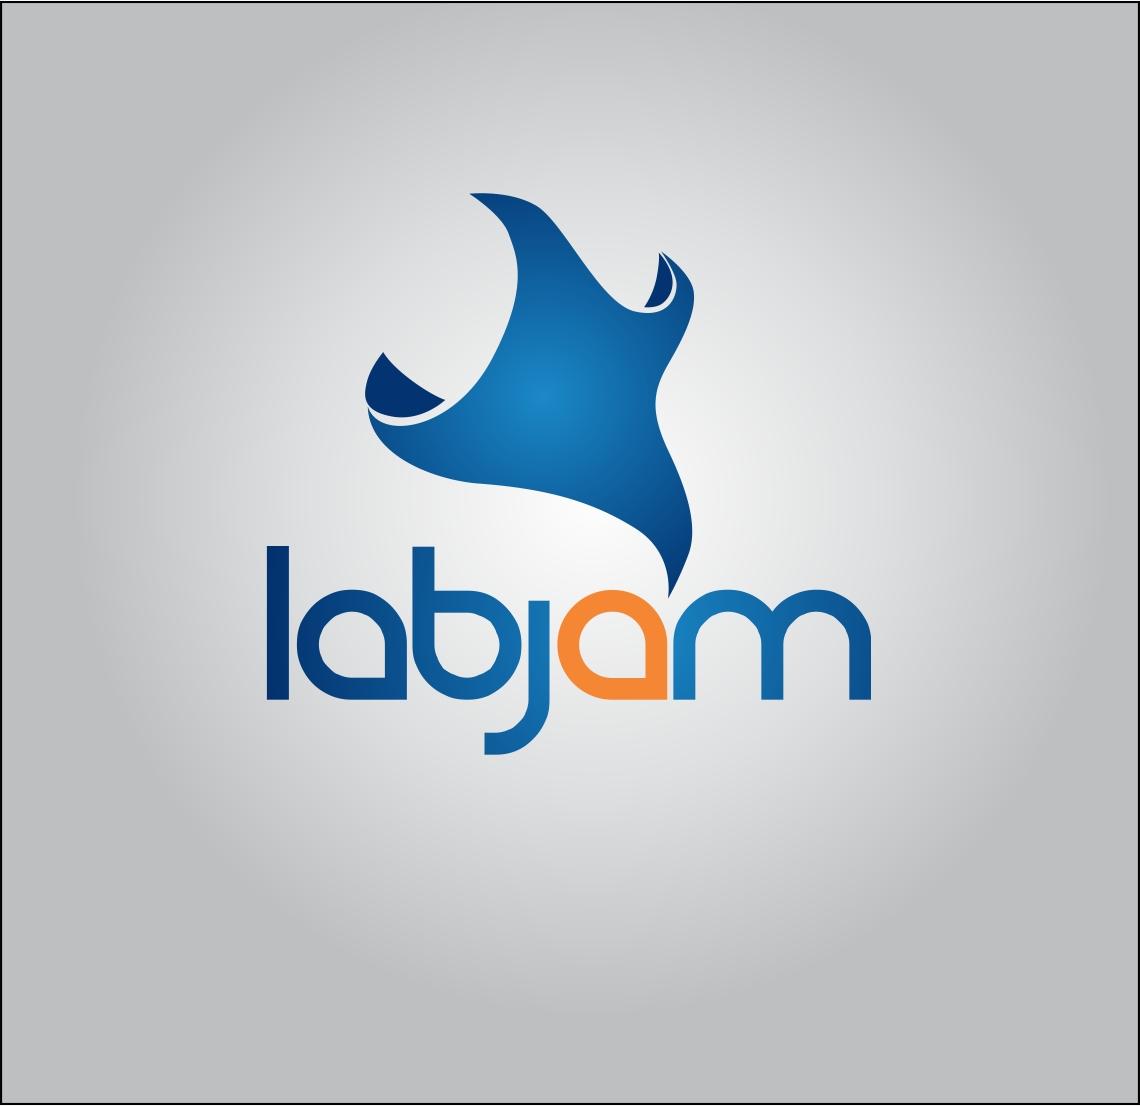 Logo Design by arkvisdesigns - Entry No. 198 in the Logo Design Contest Labjam.